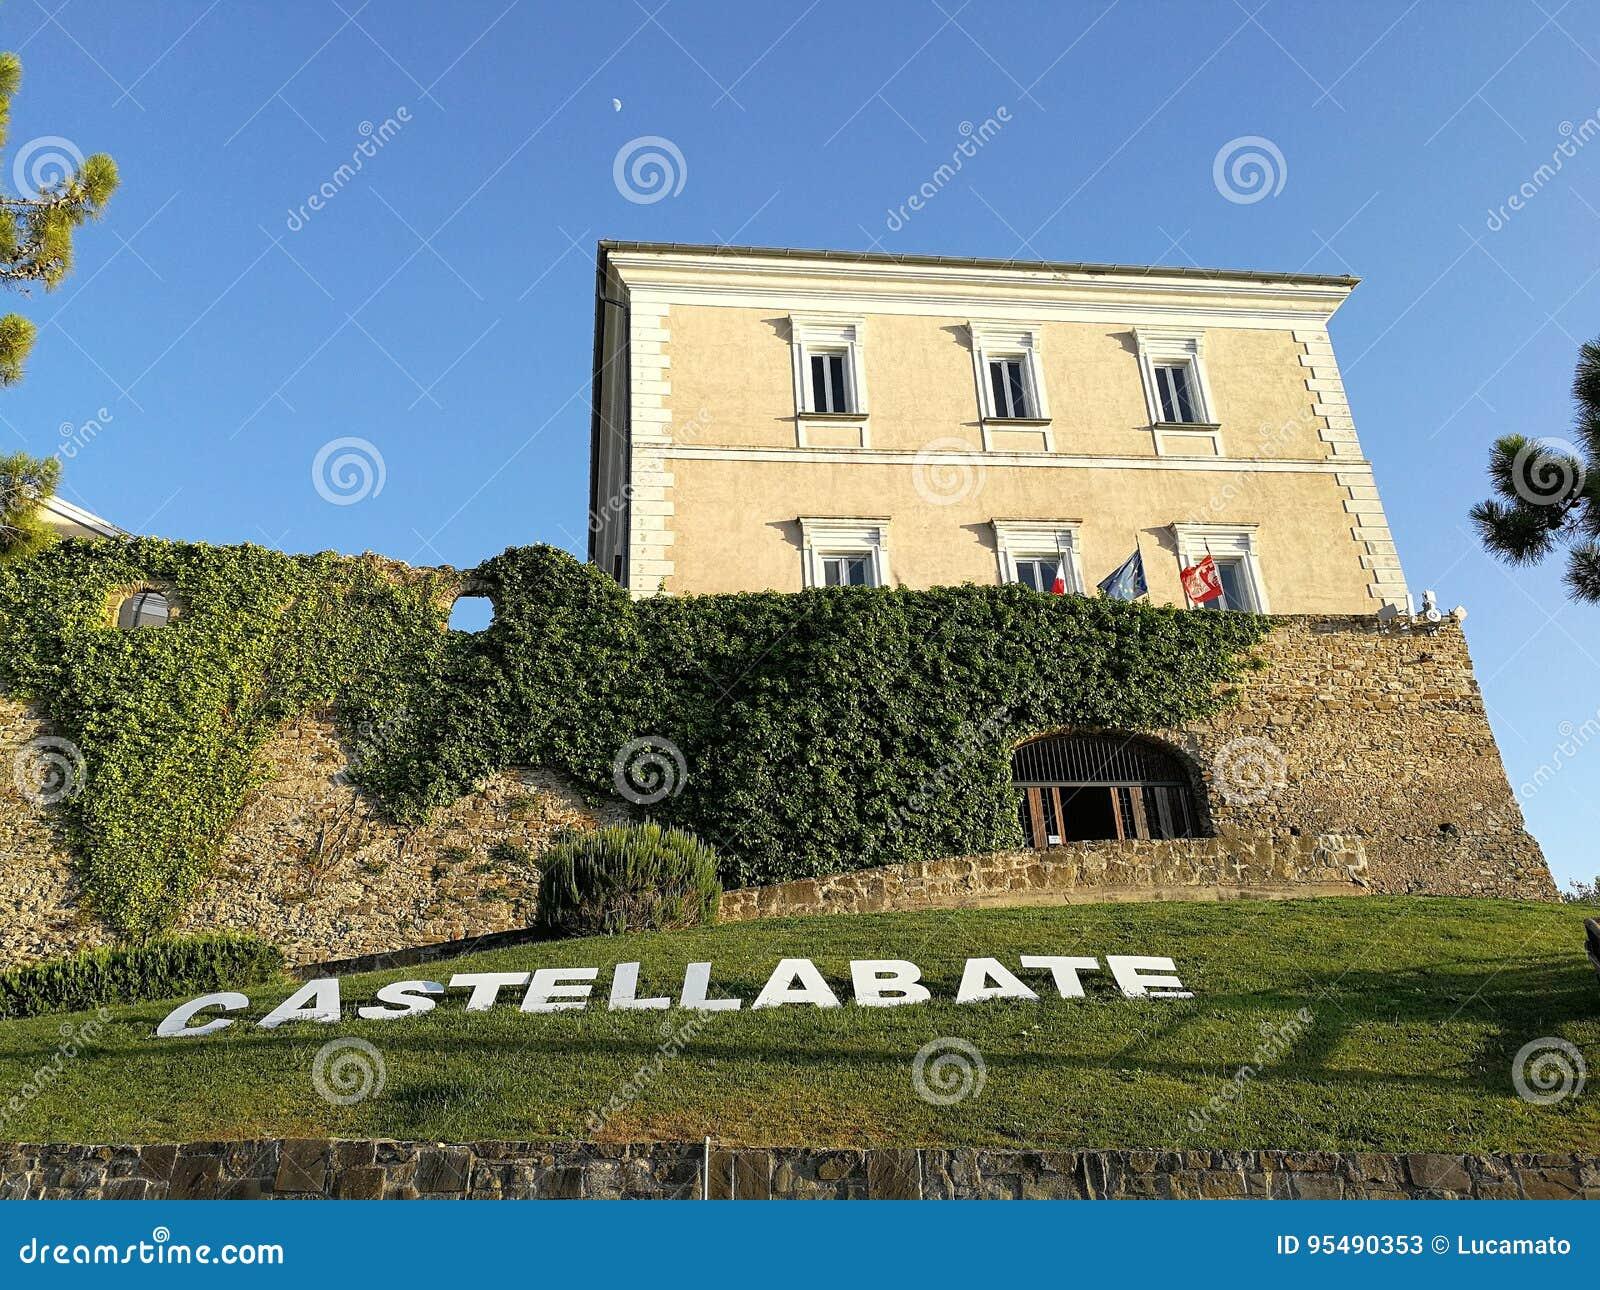 Castellabate - Abbey Castle